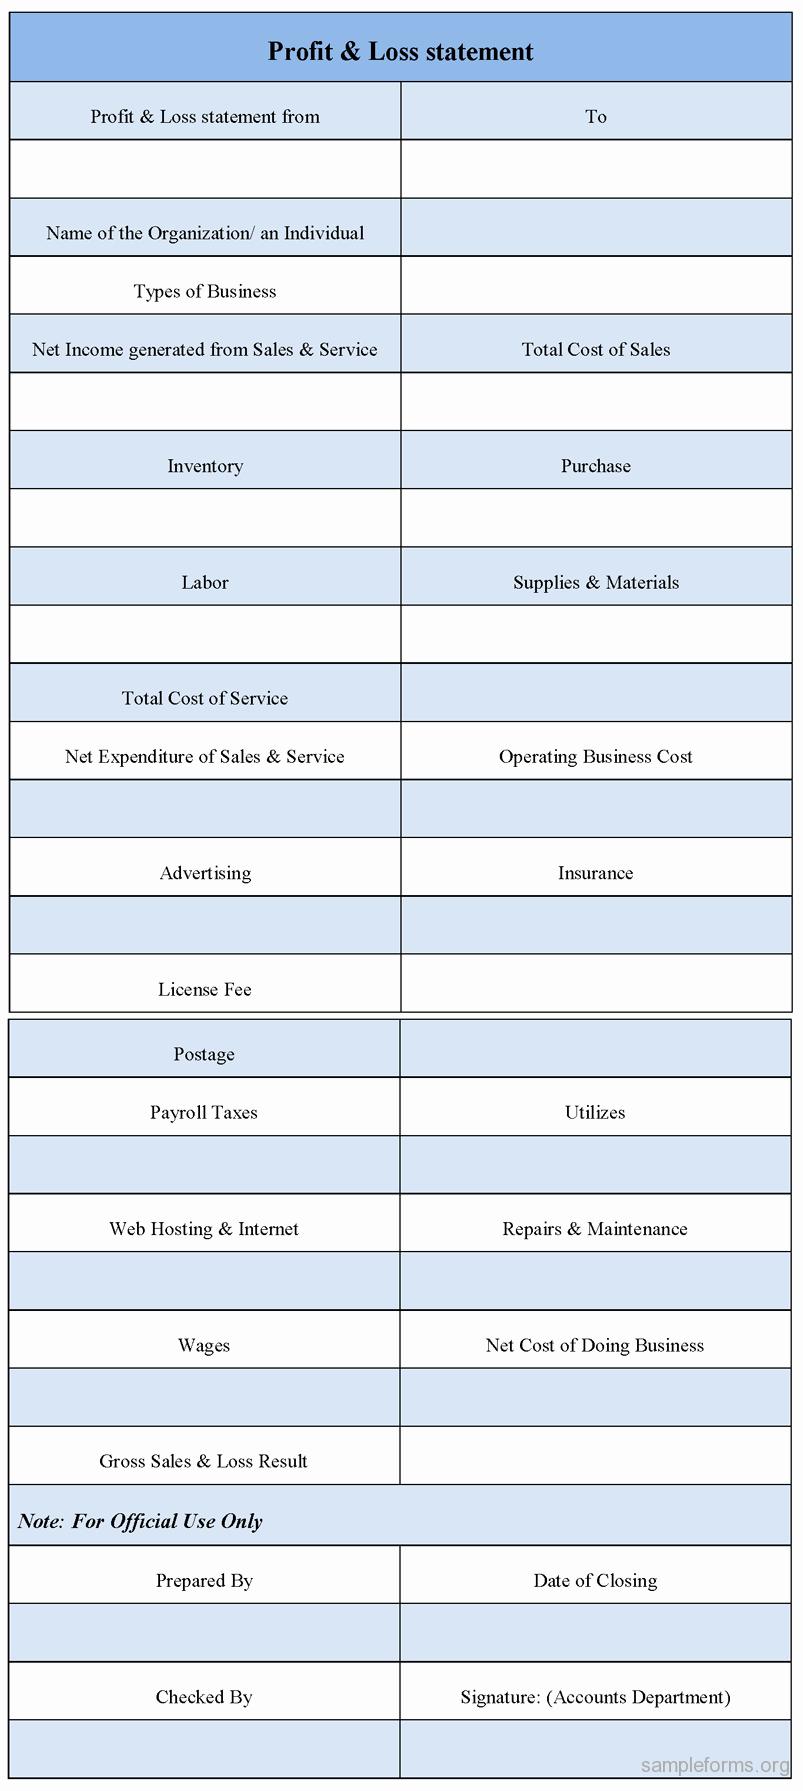 Printable Profit and Loss Statement Fresh Profit and Loss Statement form Sample forms